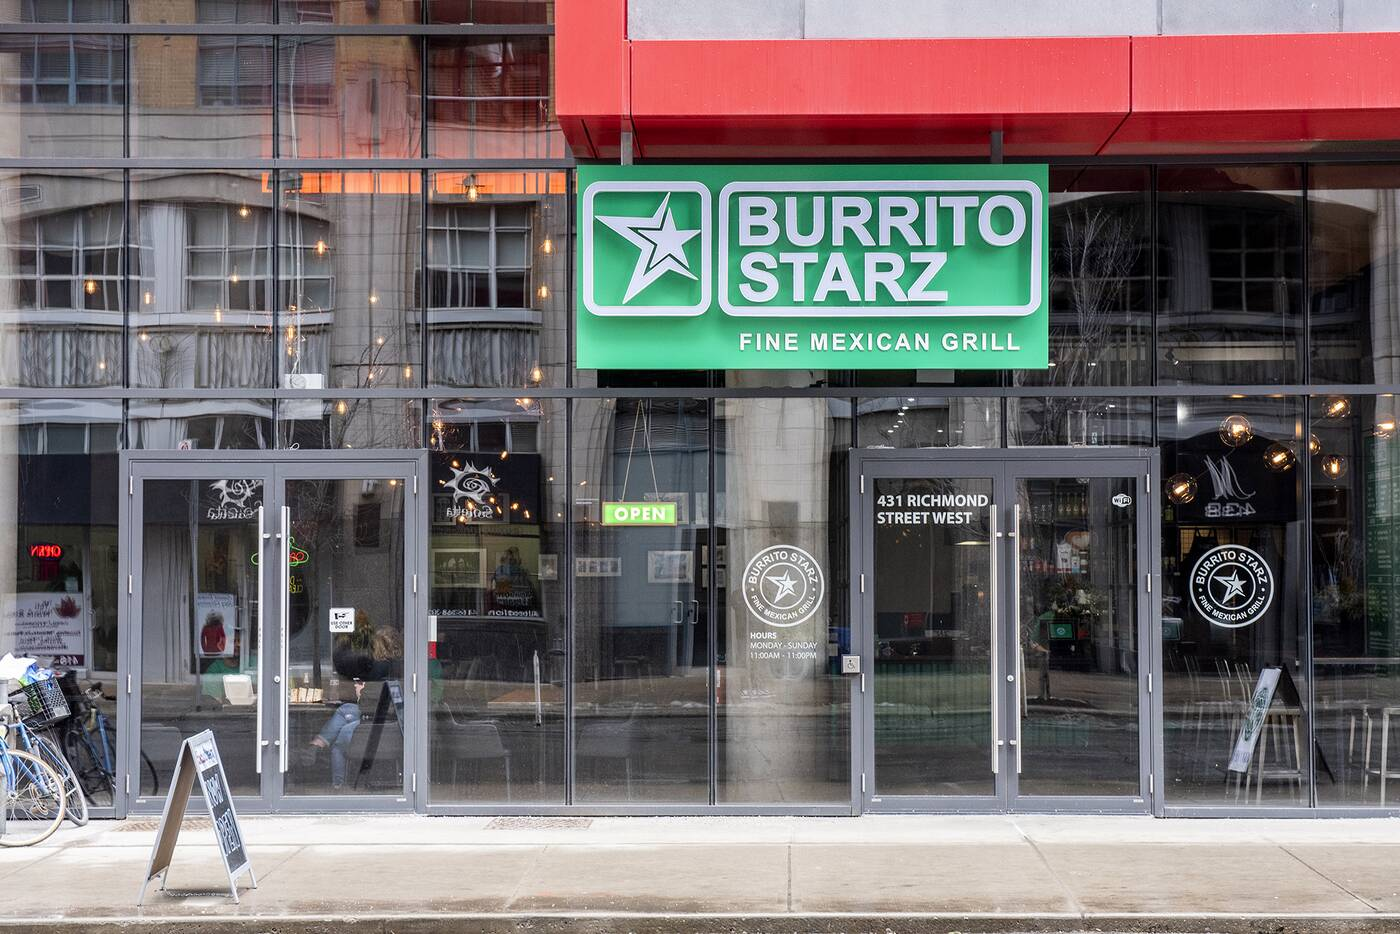 Burrito Starz Toronto